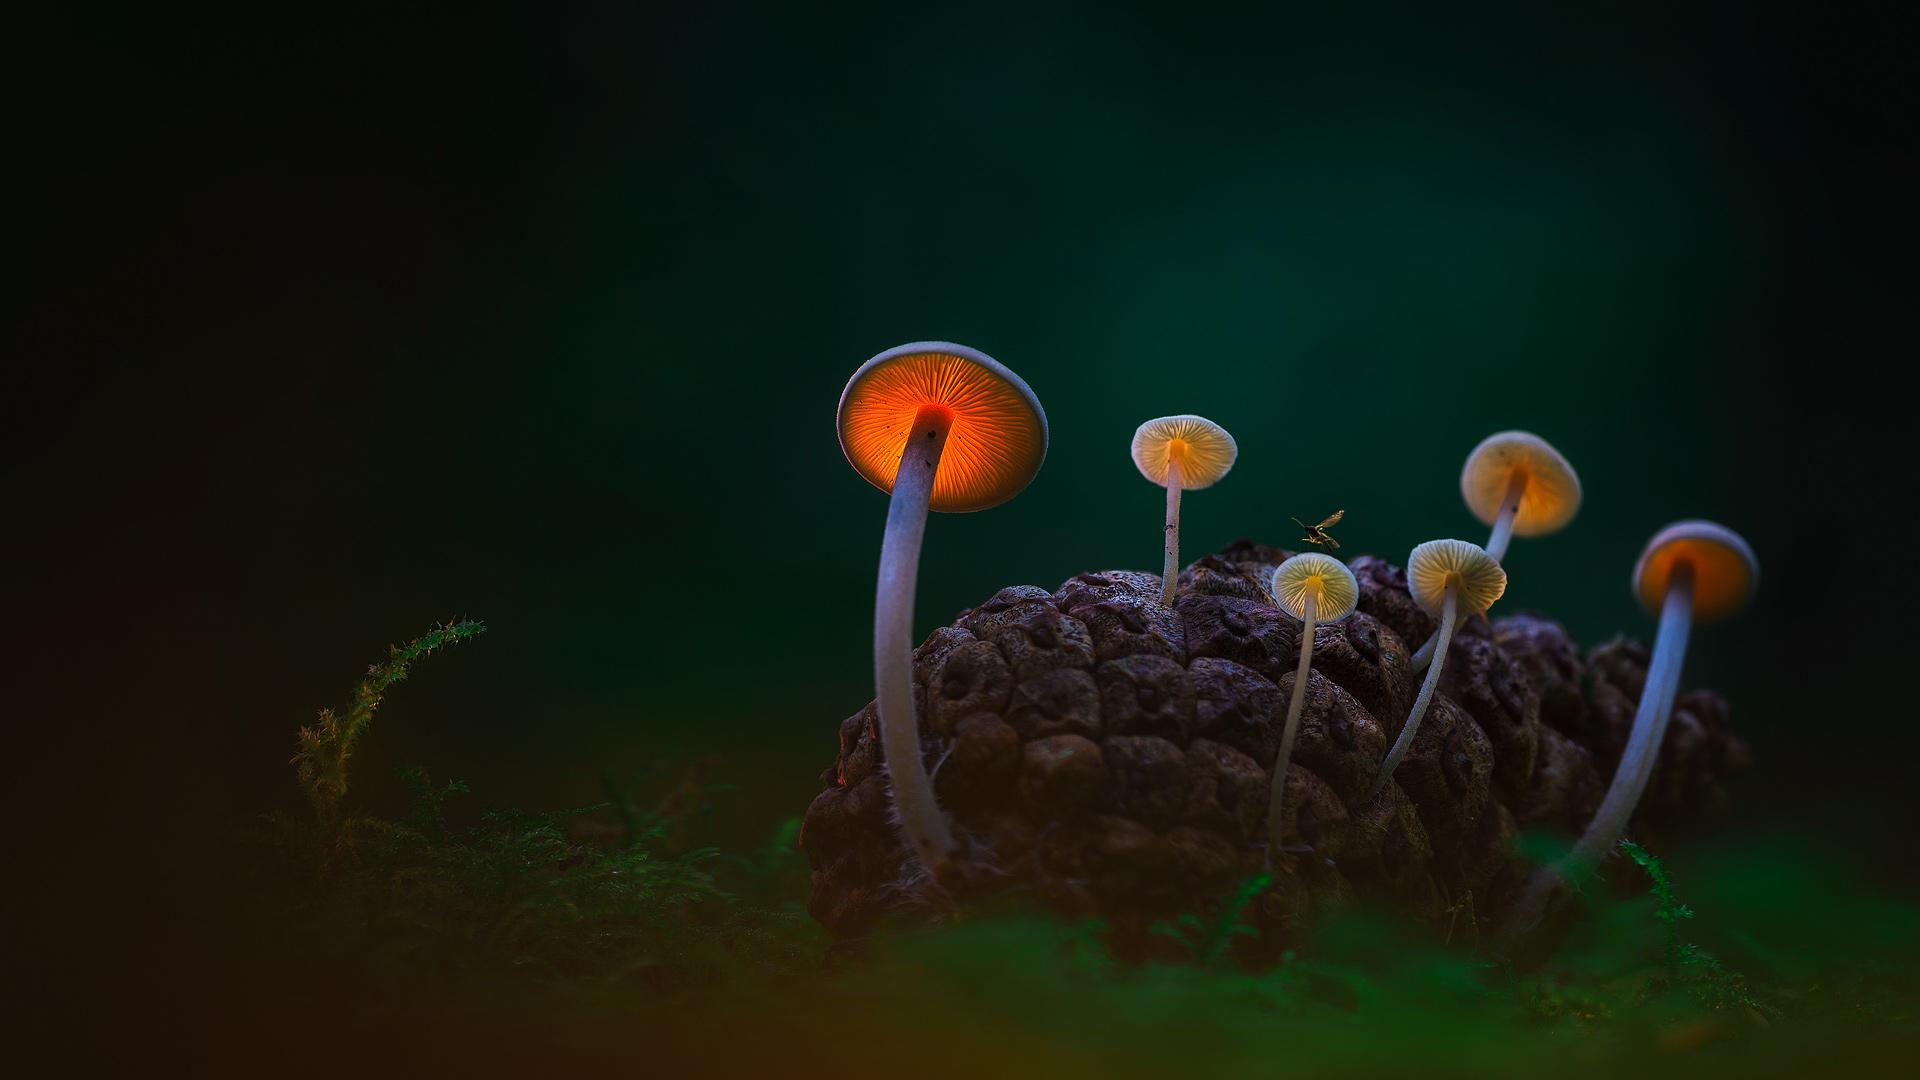 Illuminated Mushrooms